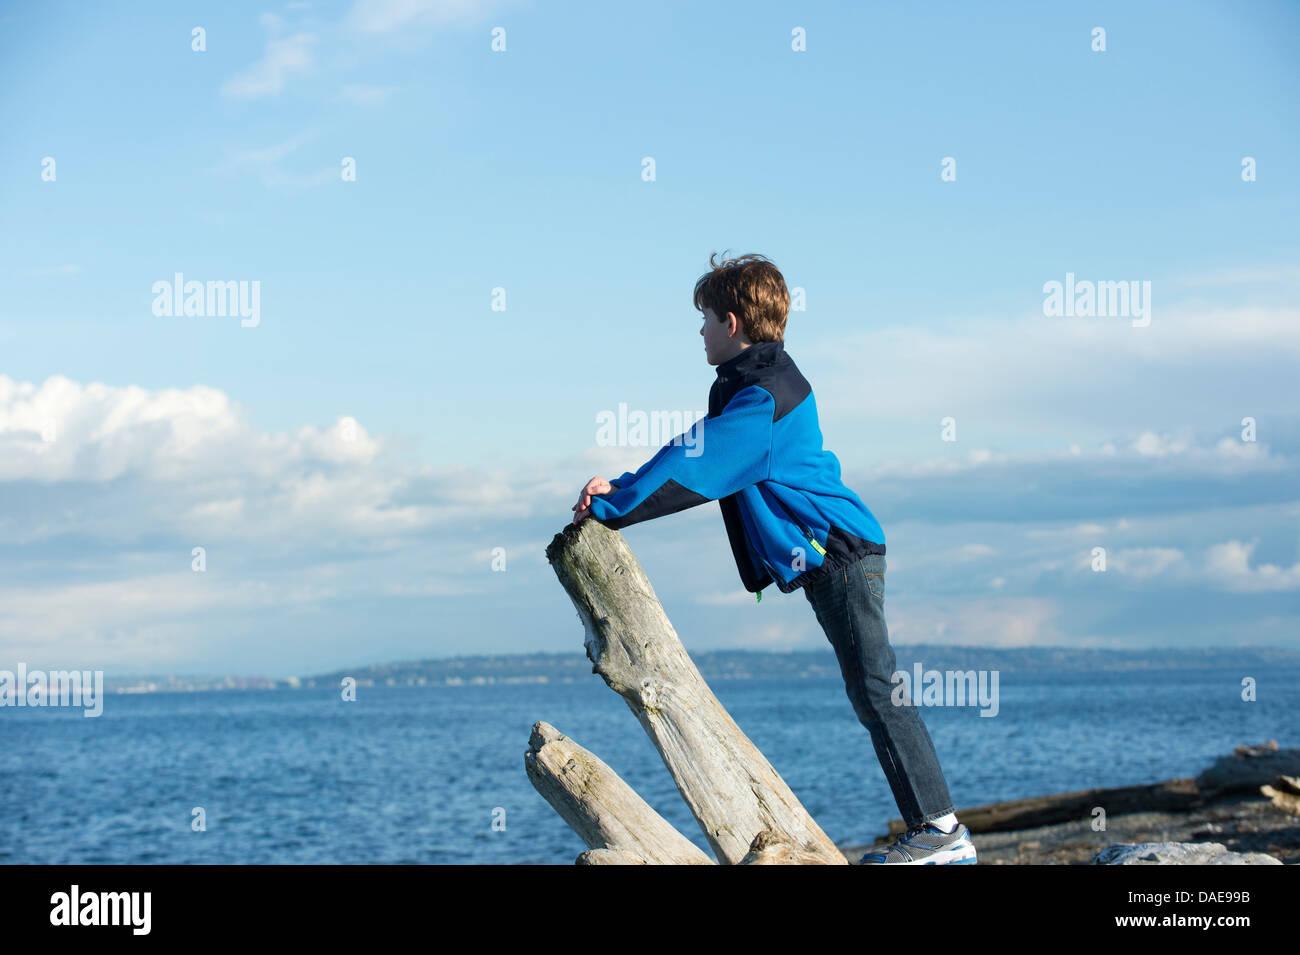 Jeune garçon à partir de Bainbridge Island, Washington State, USA Photo Stock